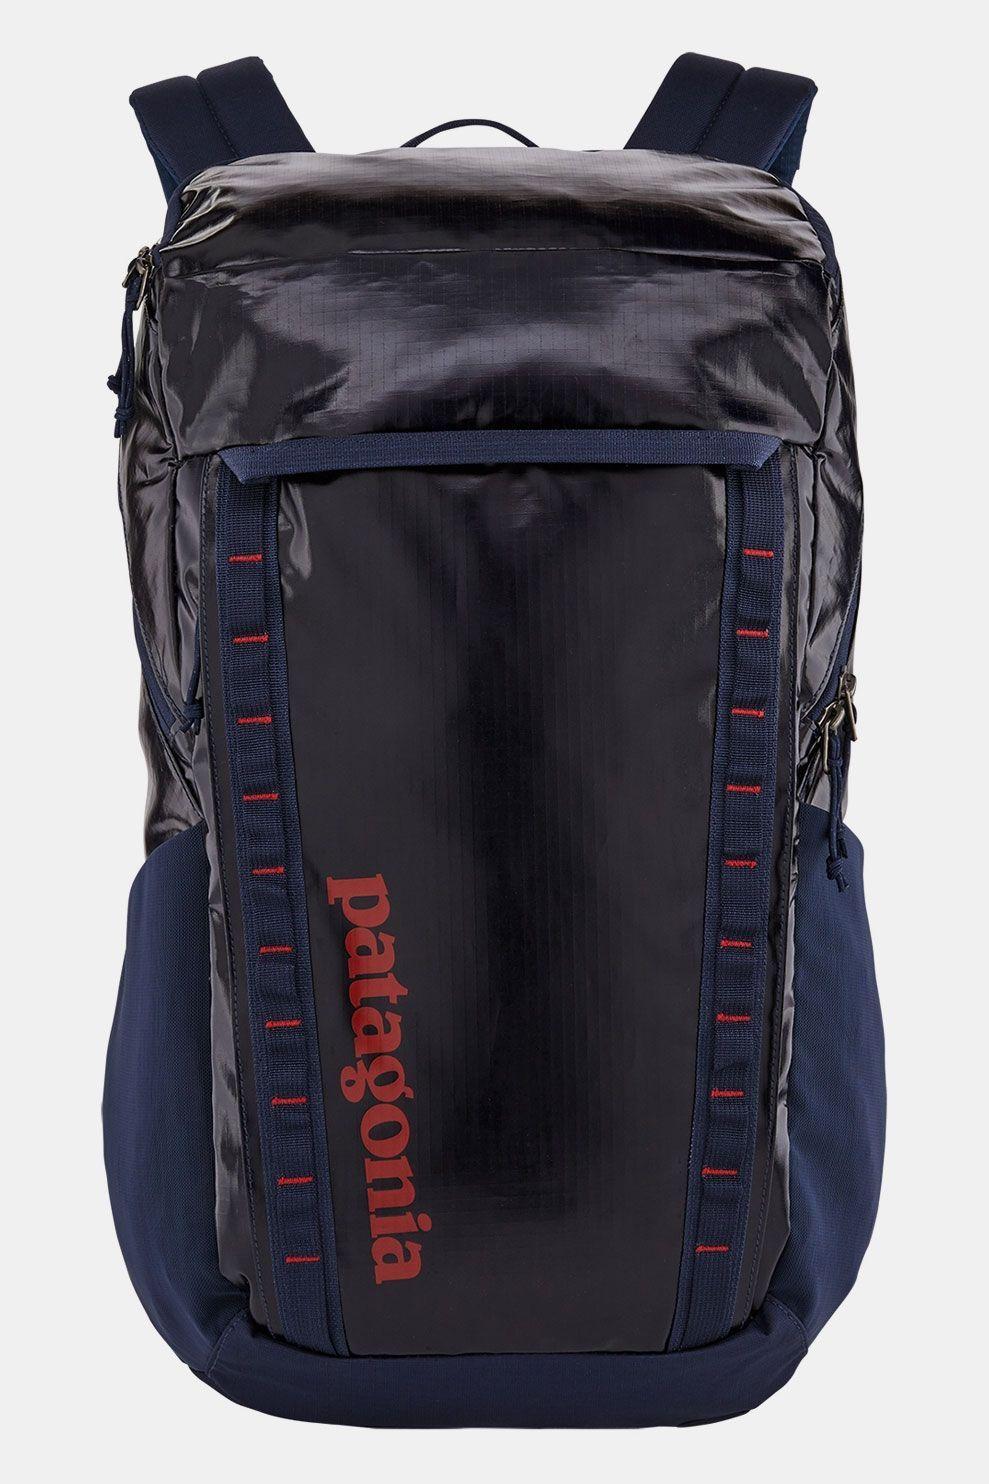 Patagonia Black Hole 32L Pack Rugzak Marineblauw